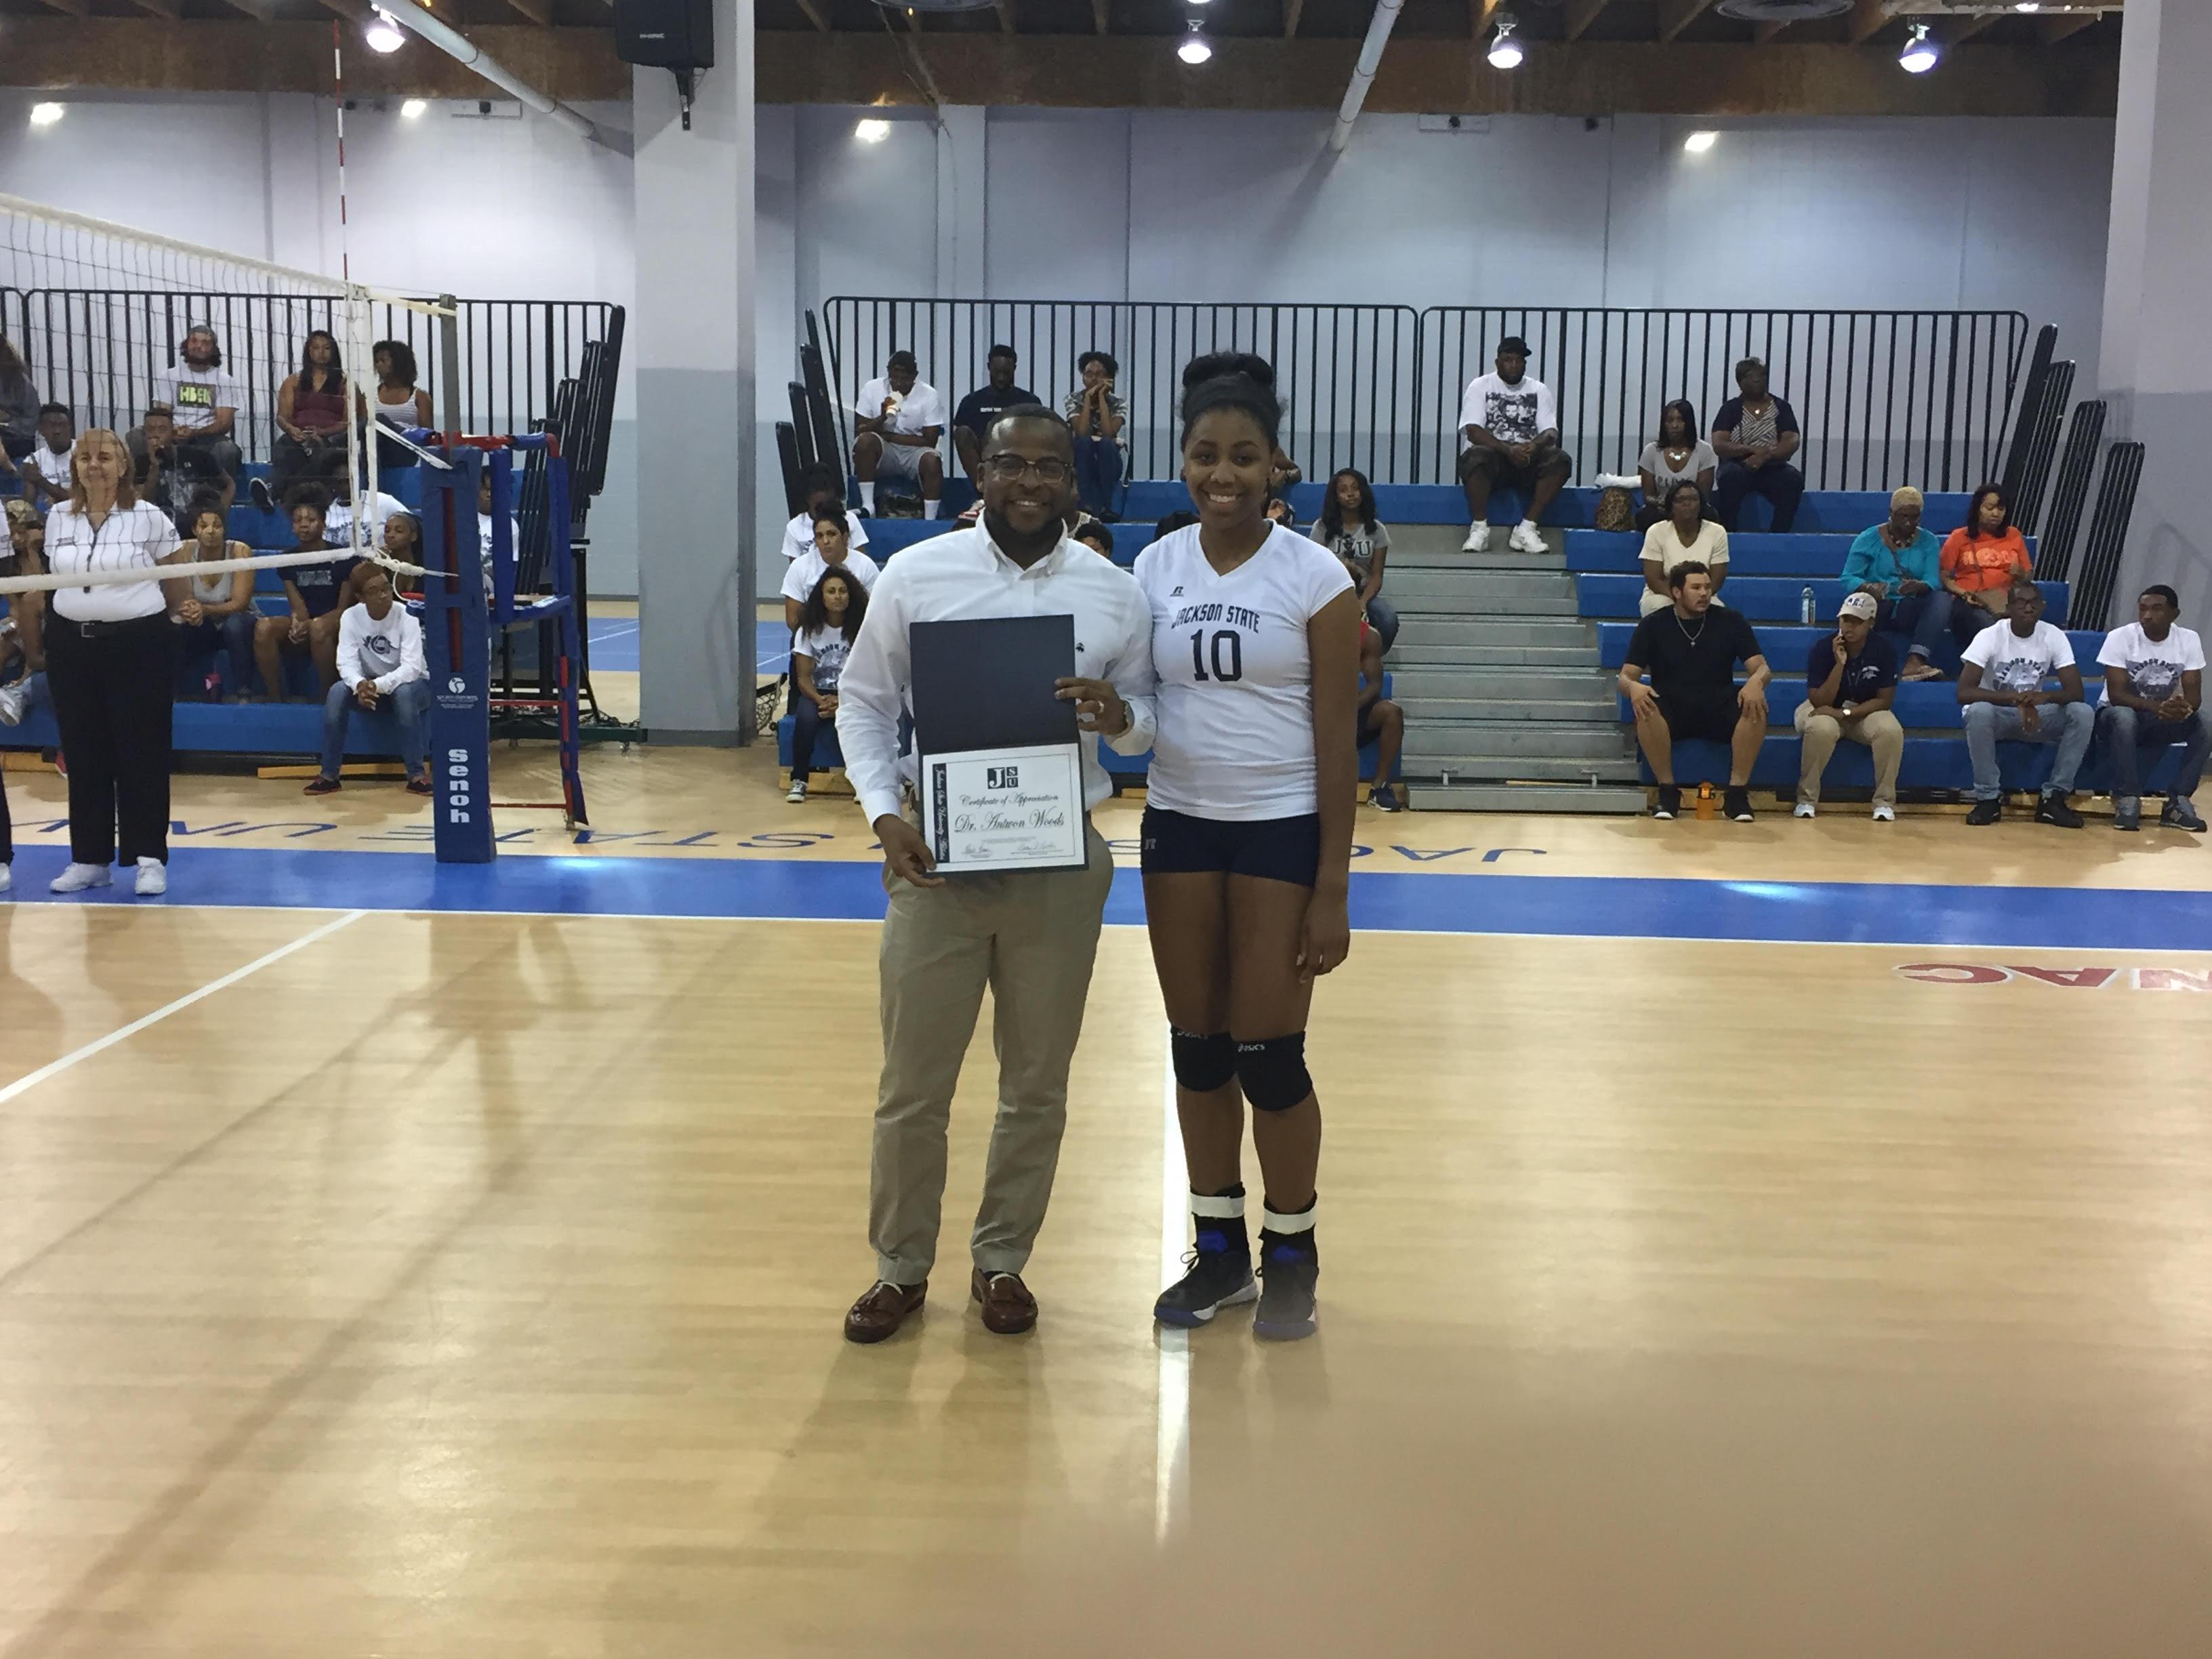 JSU Volleyball vs TX Southern 9/24